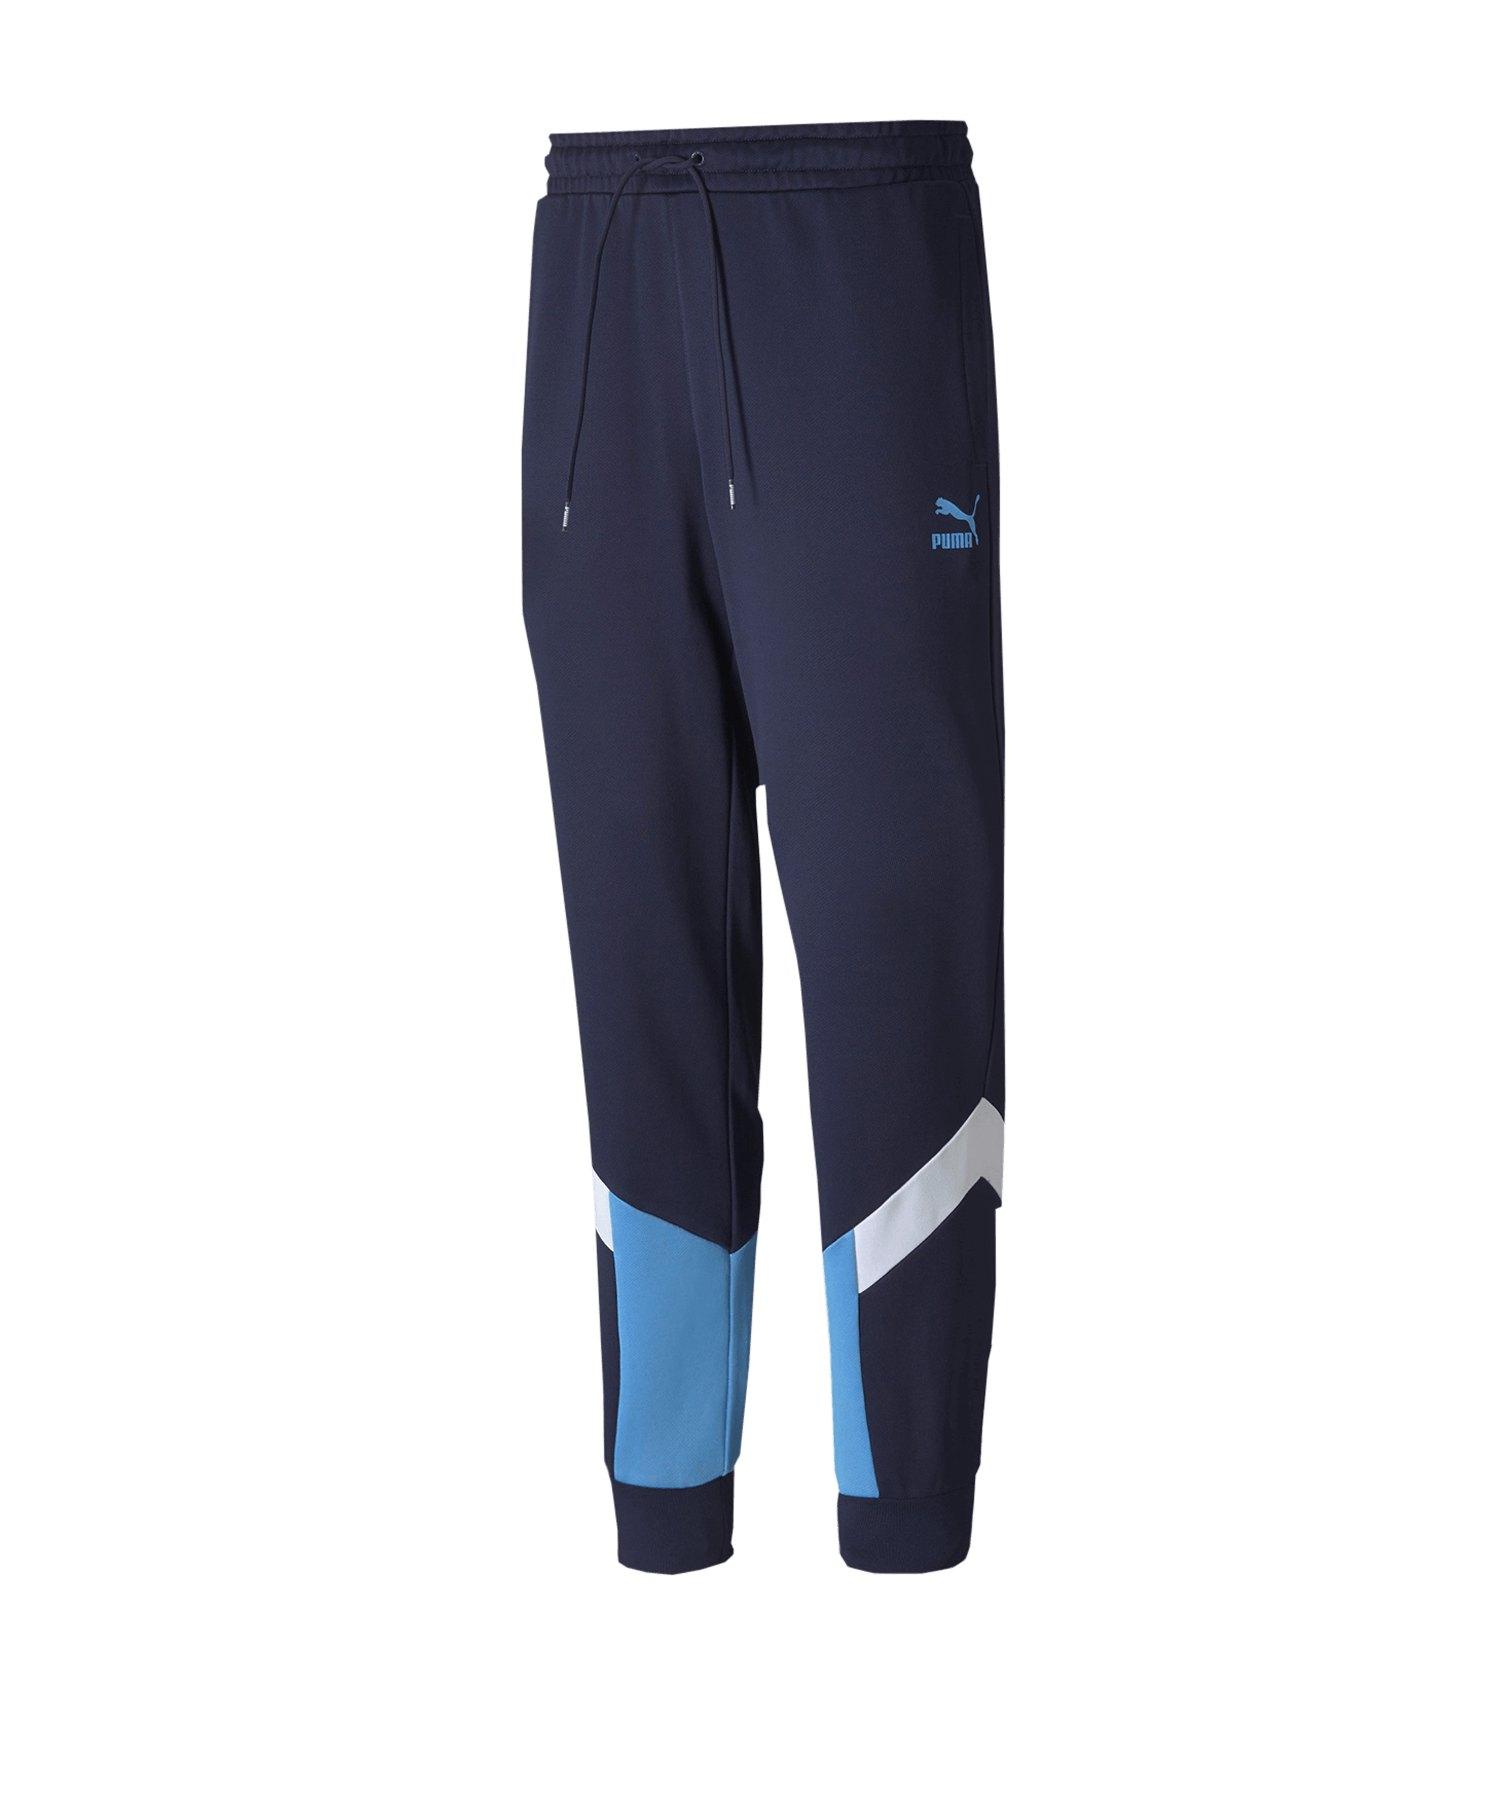 Puma Manchester City Jogginghose Blau F25 - blau